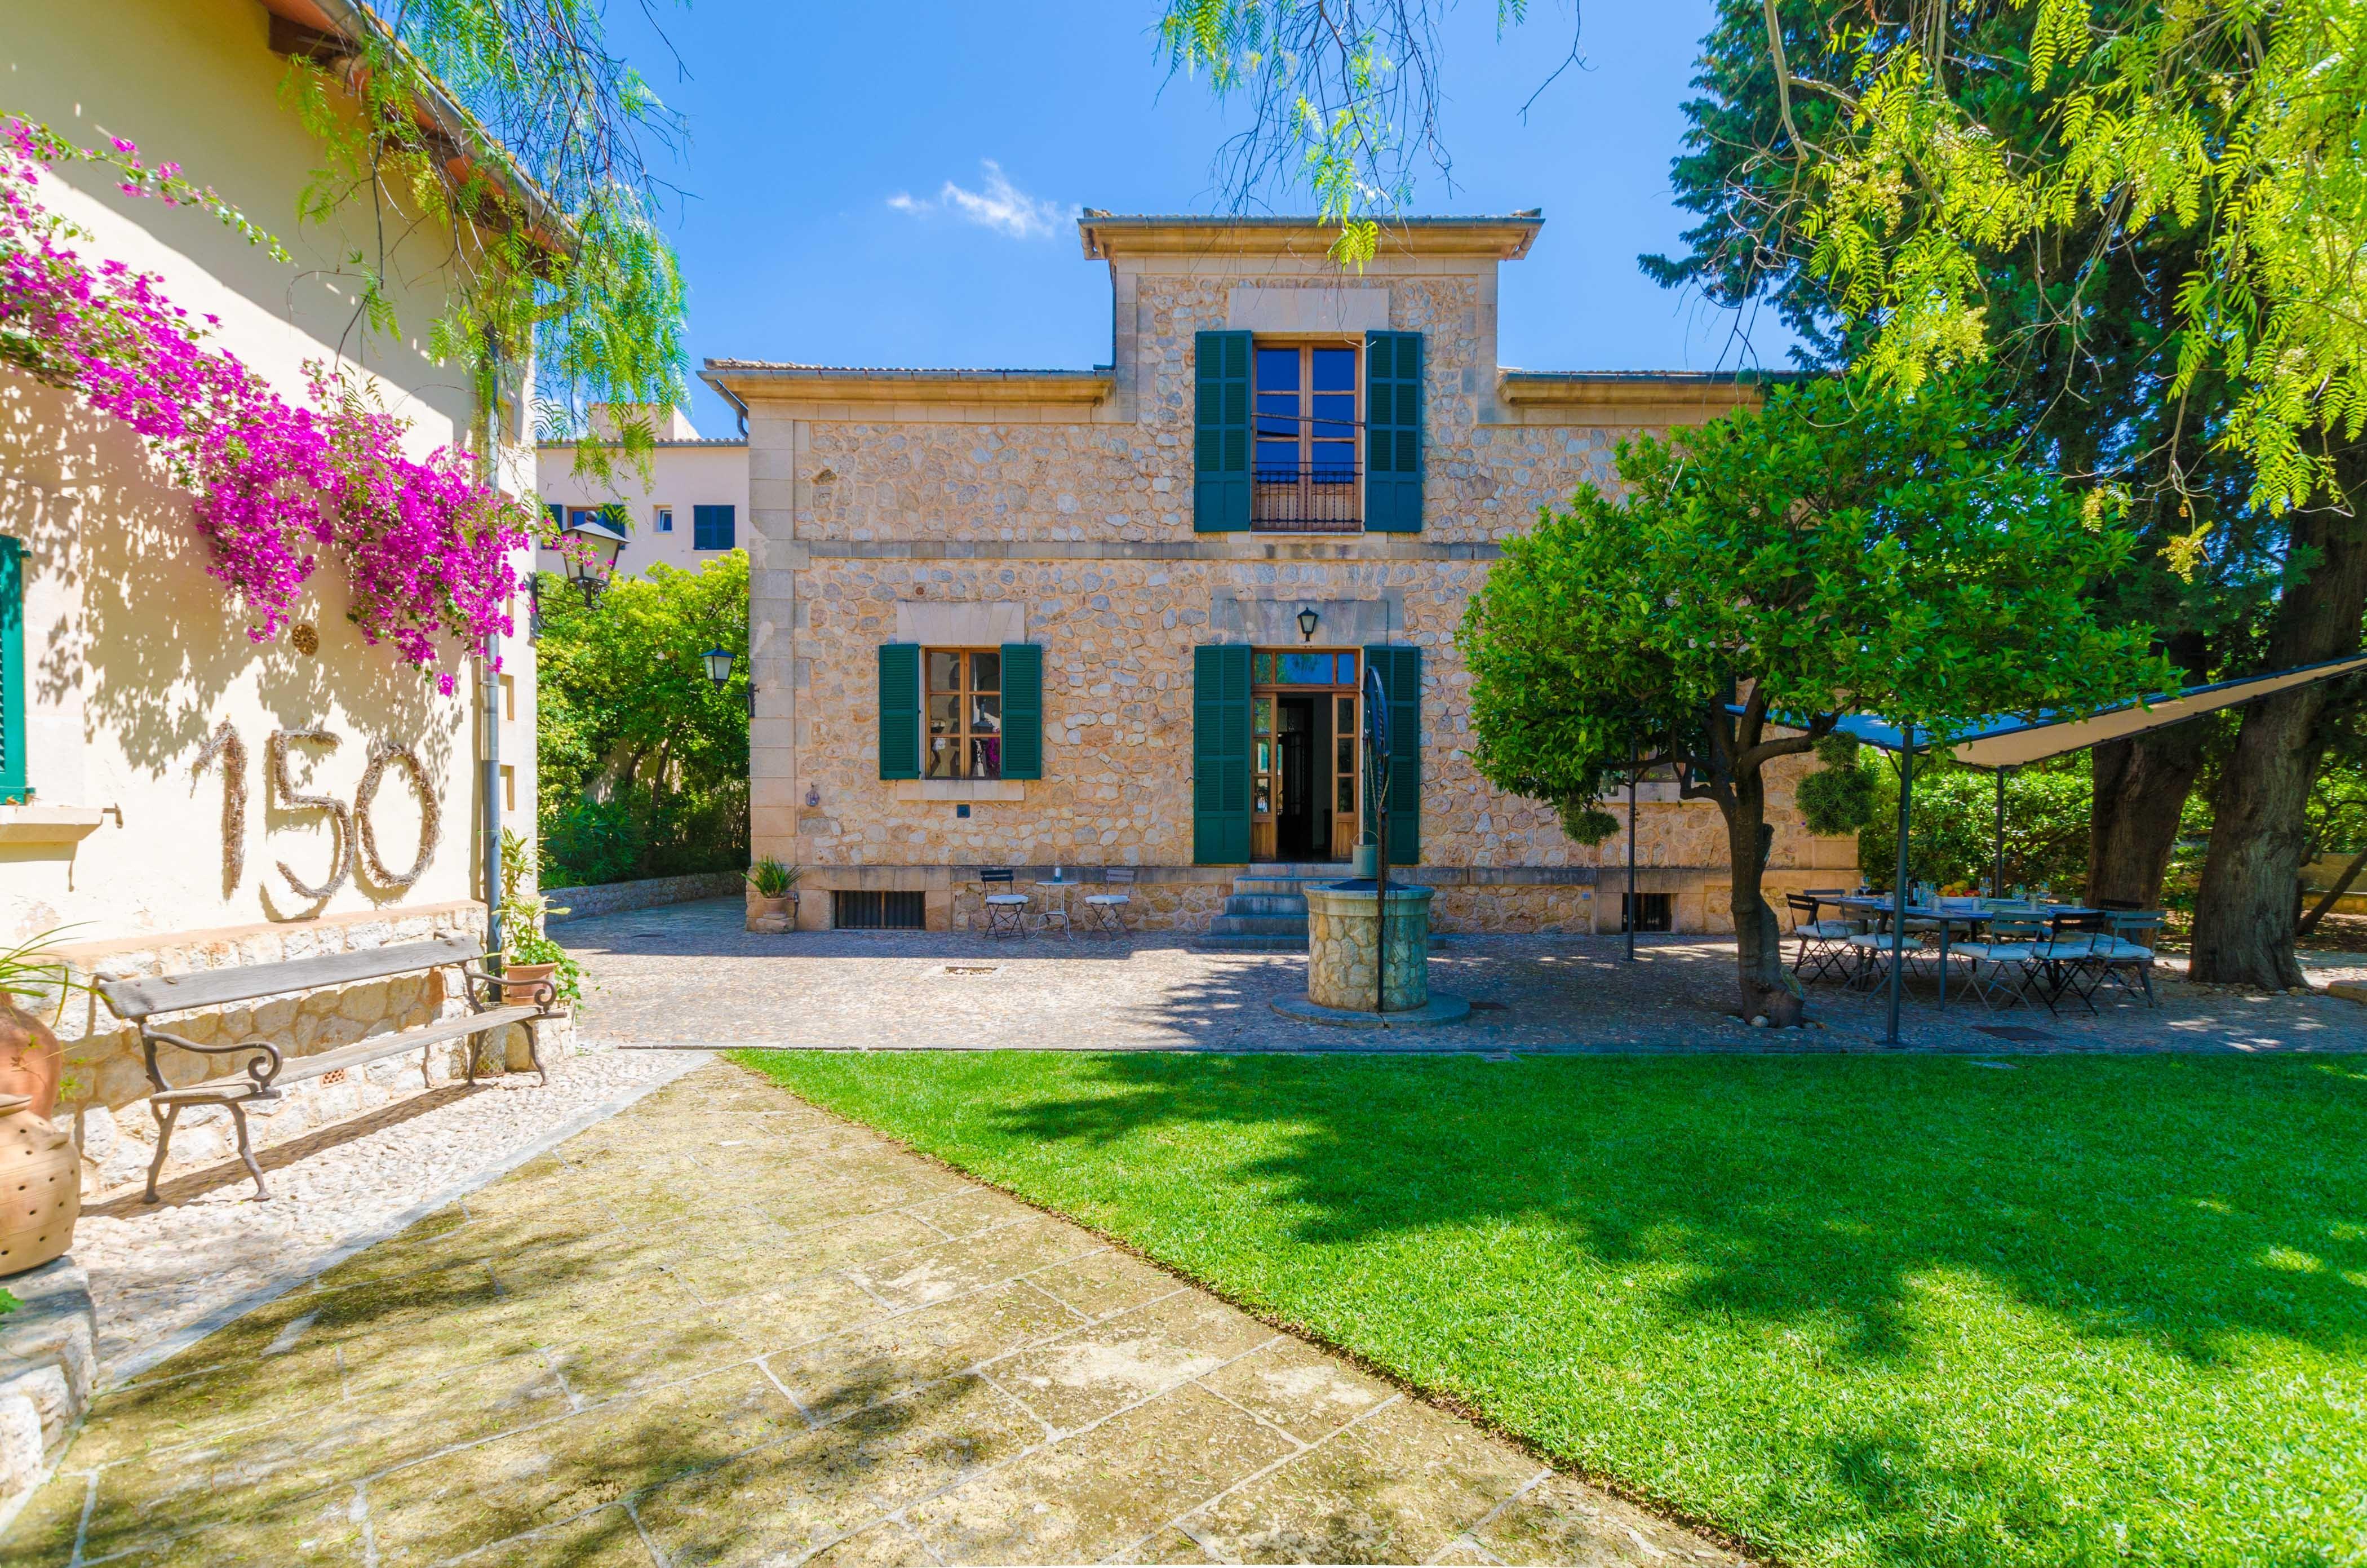 Maison de vacances CAS CONVIDATS (2435013), Alaro, Majorque, Iles Baléares, Espagne, image 2